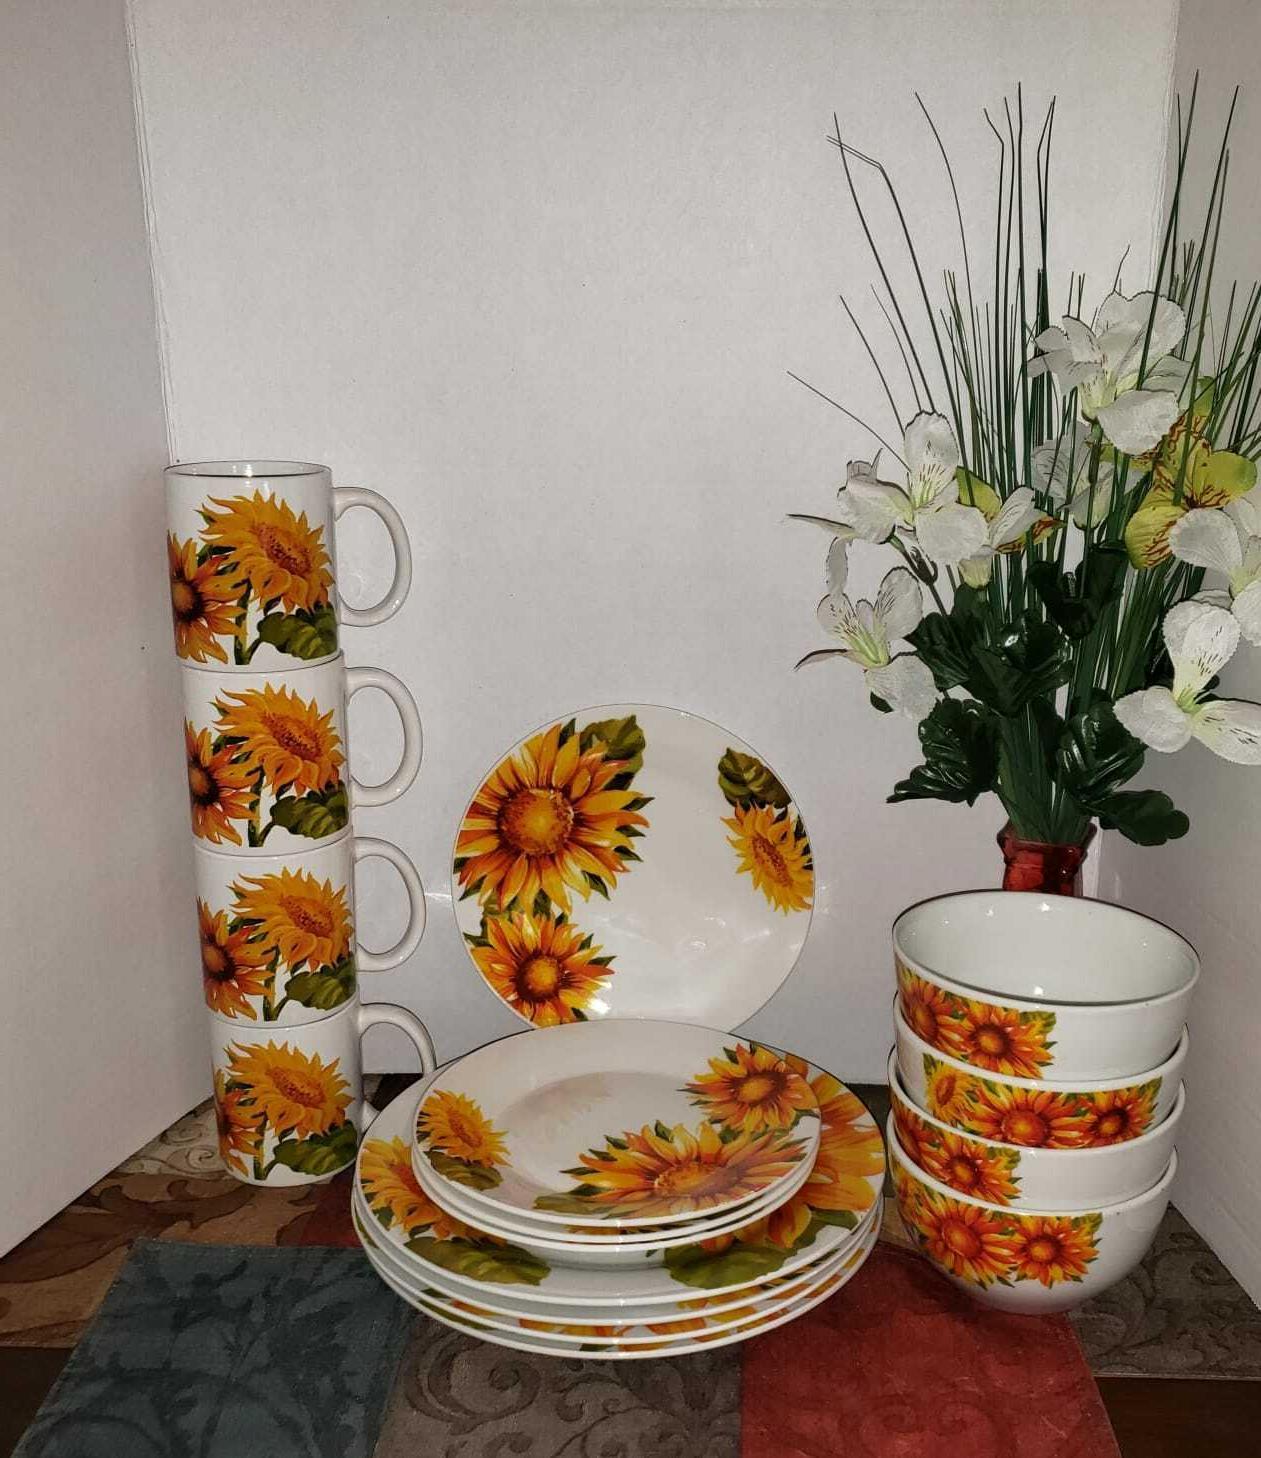 Sunflower Dinnerware Home Collection Piece